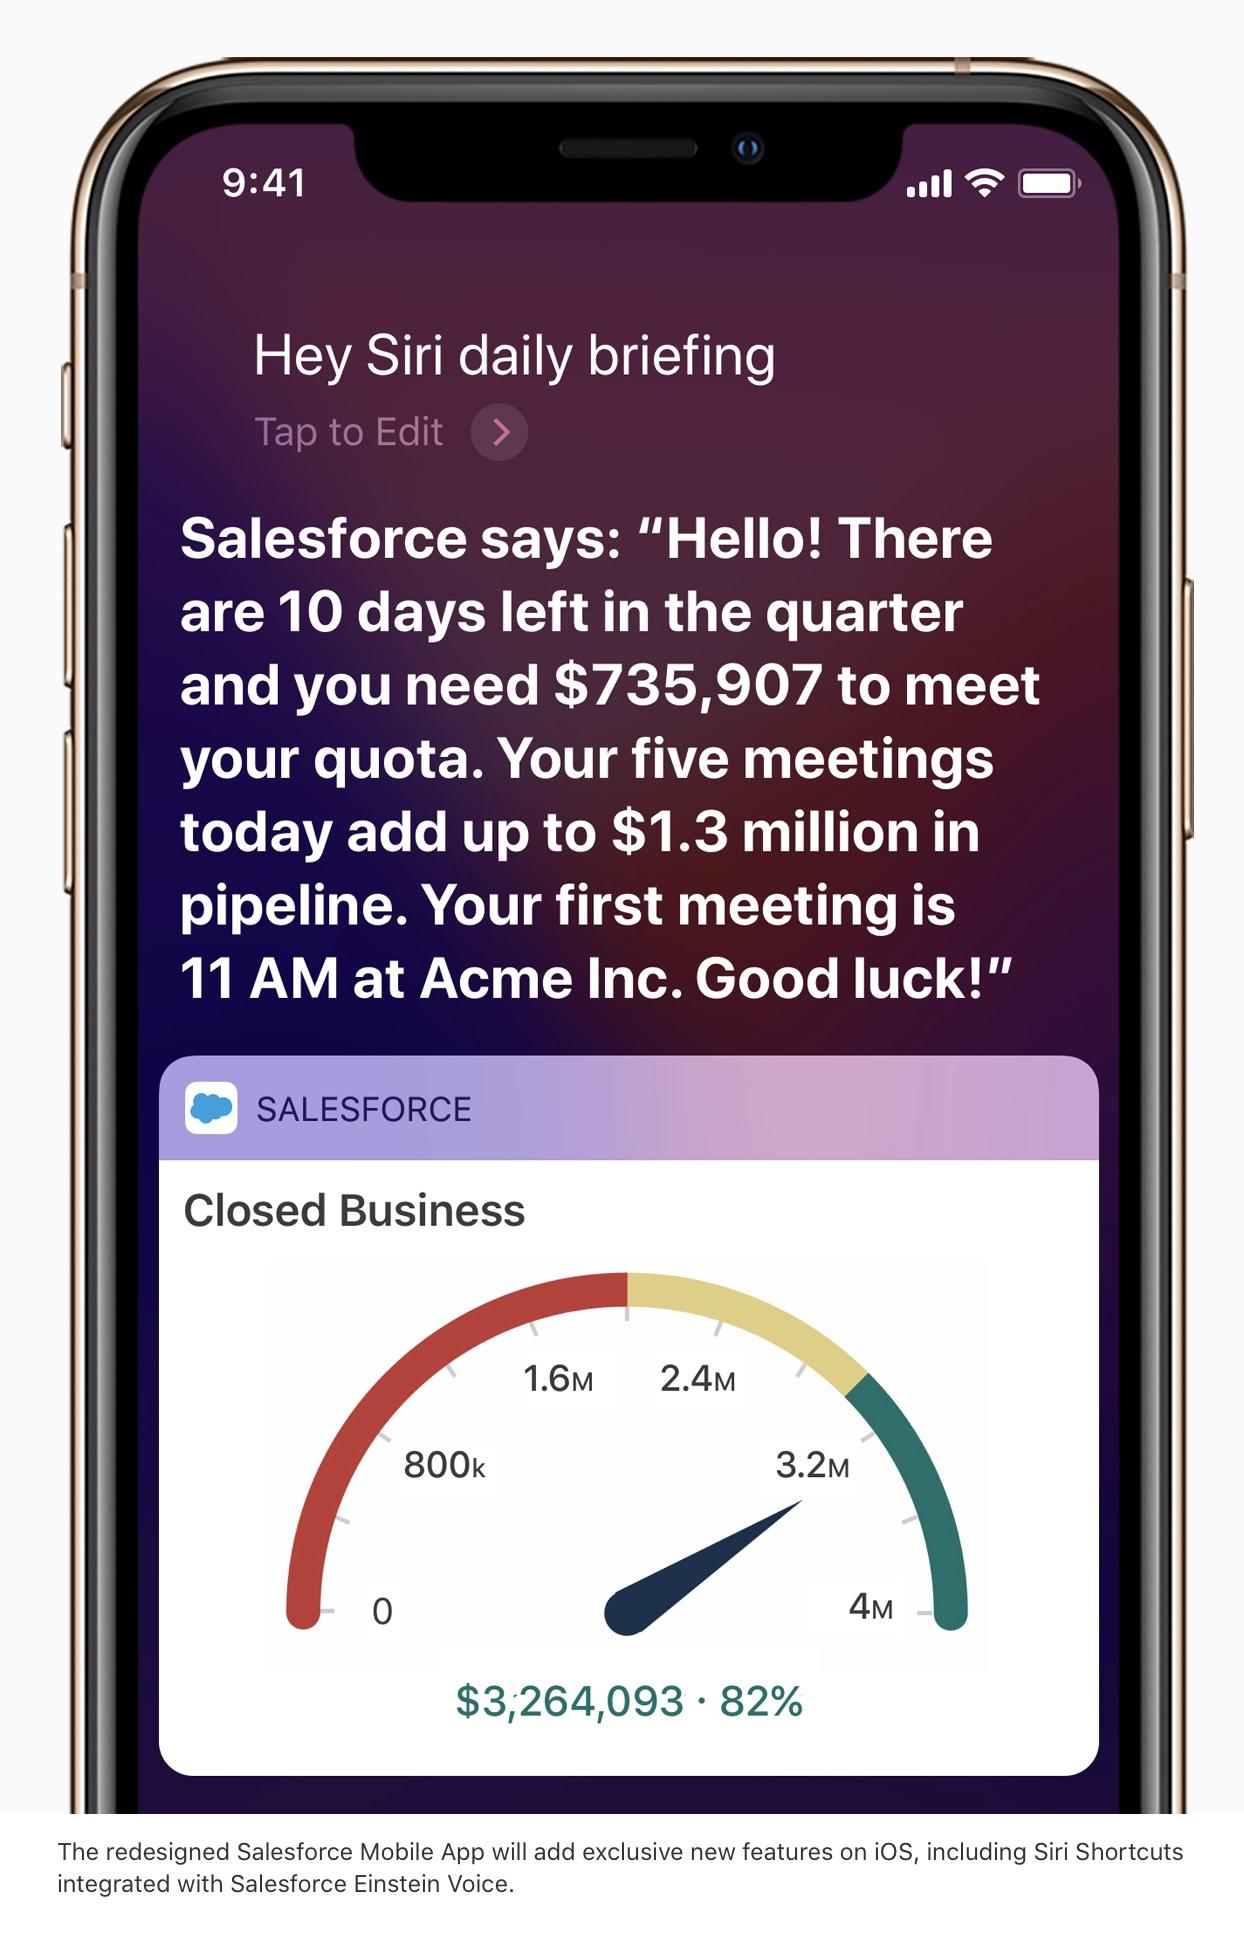 Apple, Salesforce announce a strategic partnership